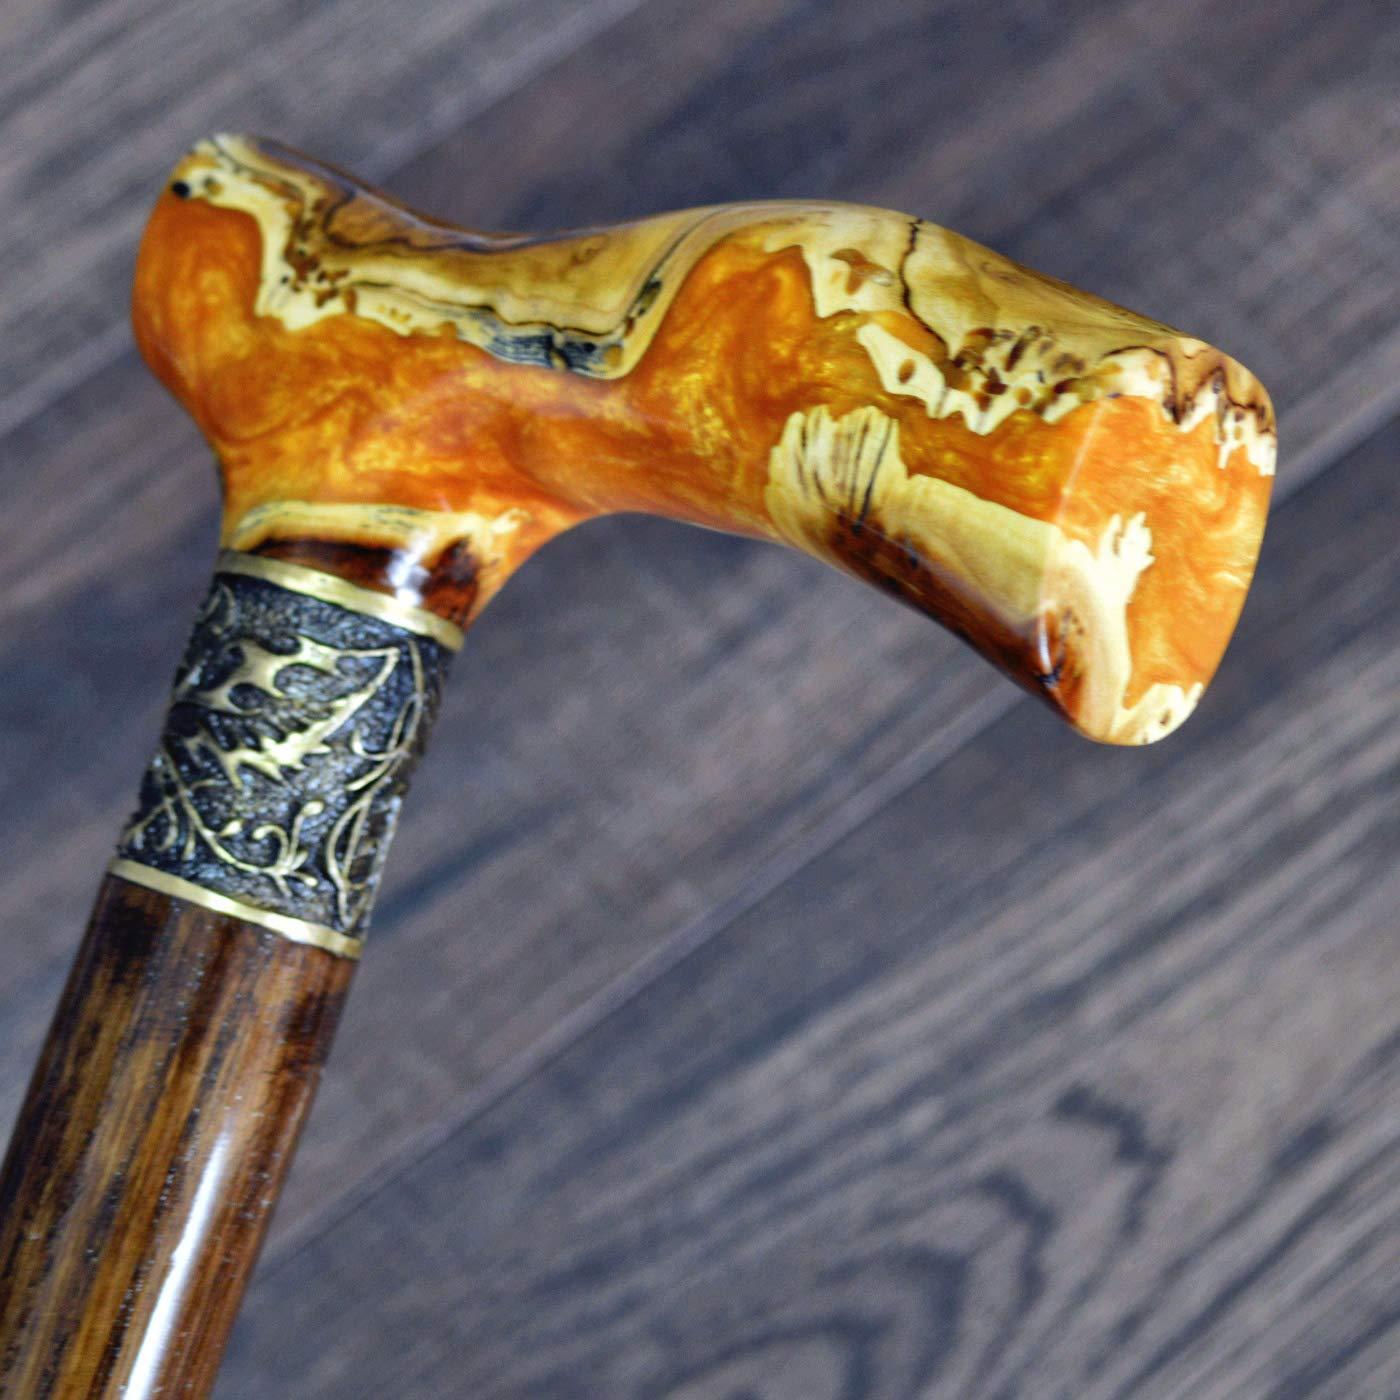 oleksandr.victory Canes Walking Sticks Wood Reeds Bronze Wooden BURL Handmade Cane Stick Men's Accessories Hybrid Orange